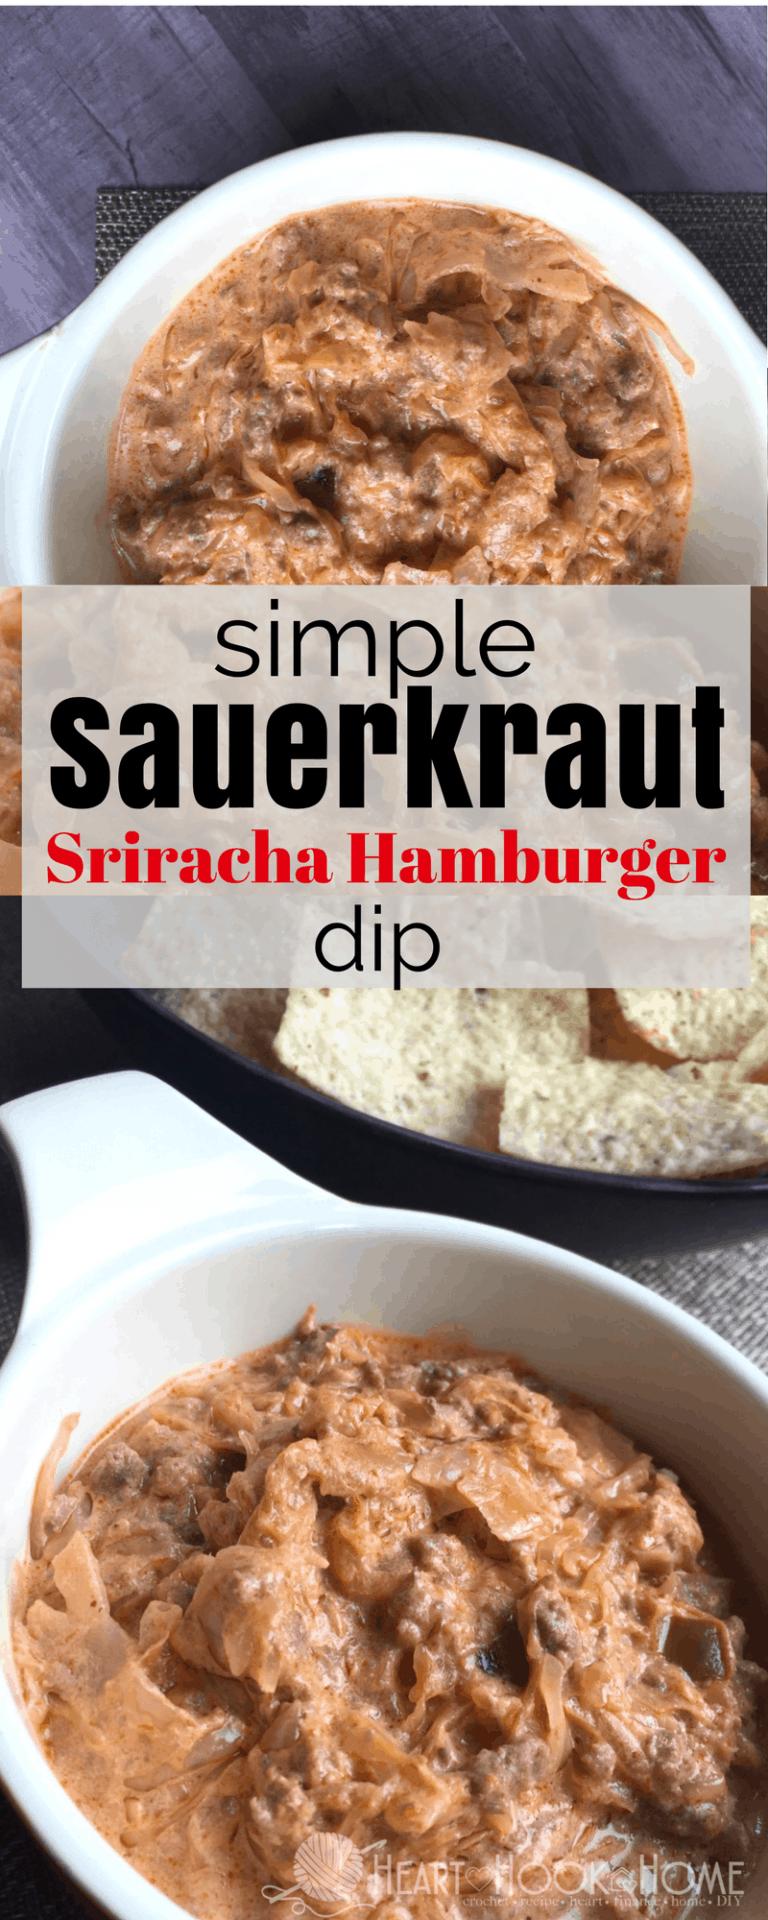 Simple Sriracha Sauerkraut Dip with Hamburger Recipe